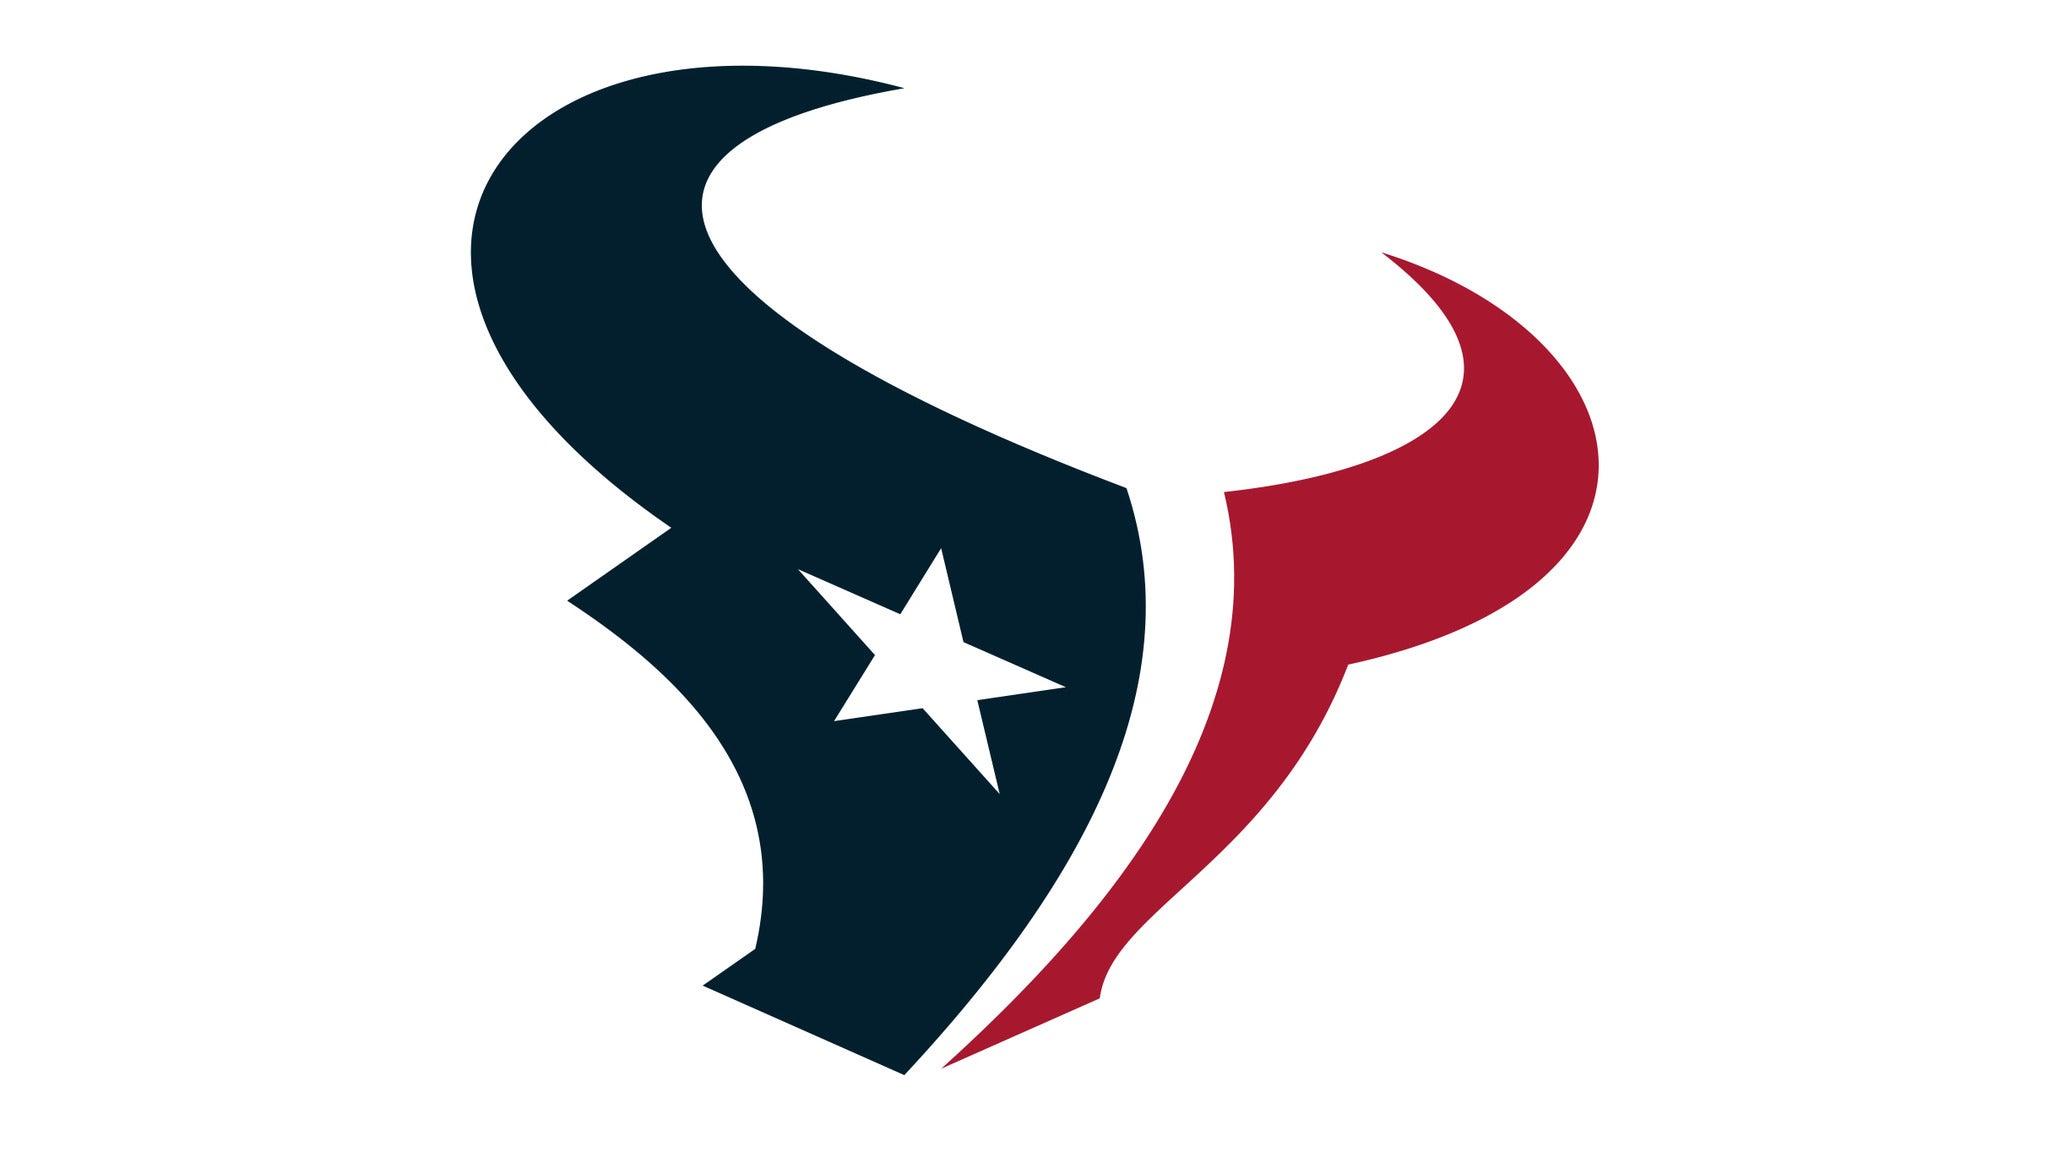 Houston Texans vs. San Diego Chargers at NRG Stadium